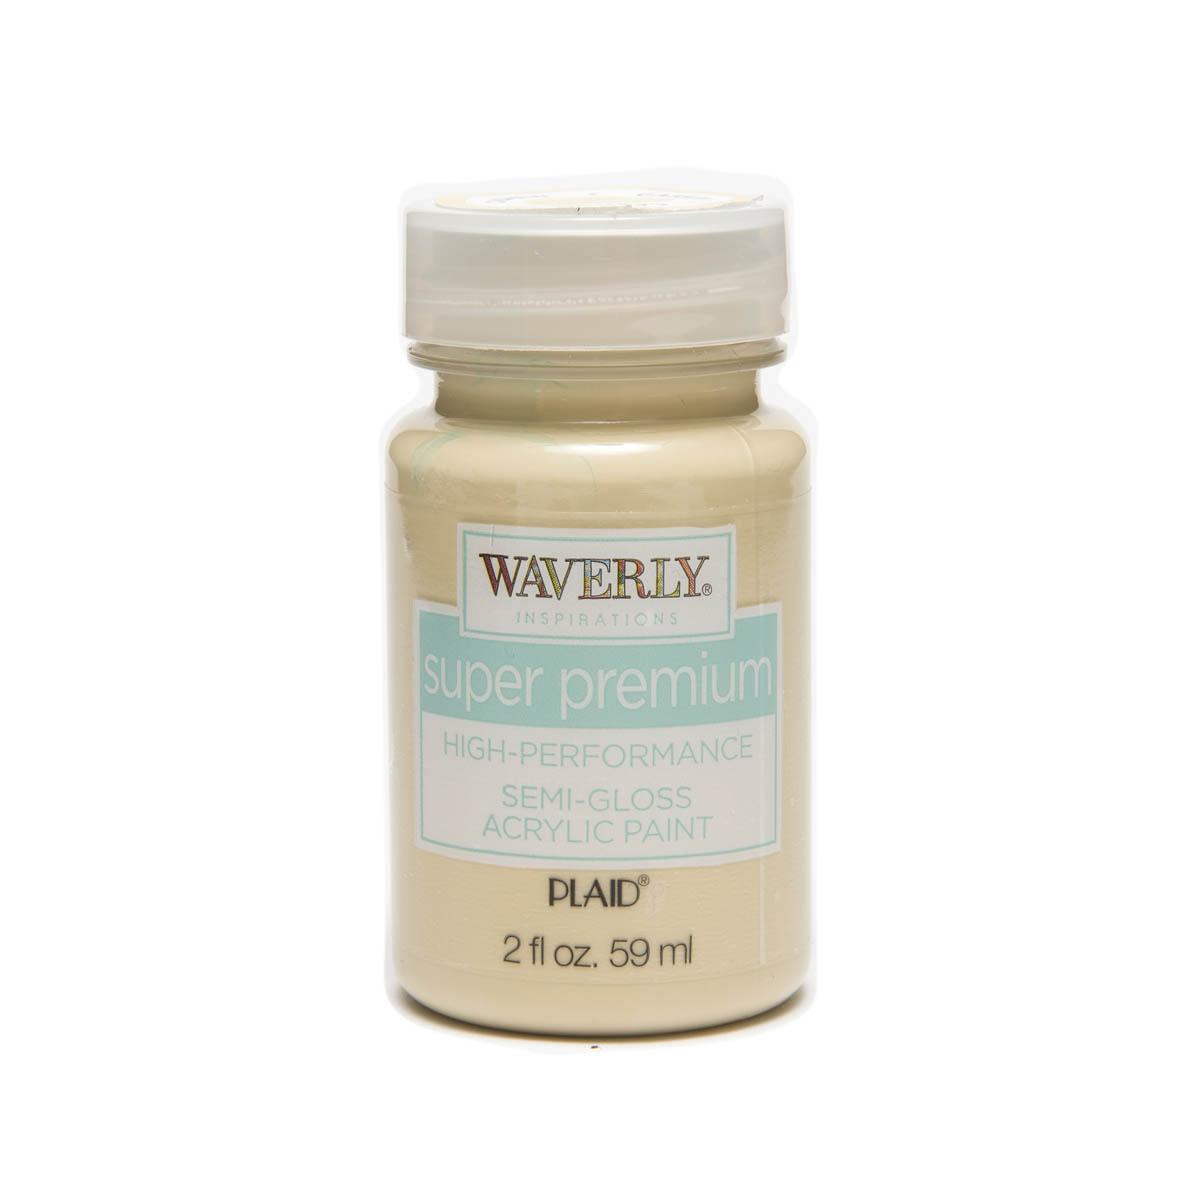 Waverly ® Inspirations Super Premium Semi-Gloss Acrylic Paint - Cashew, 2 oz. - 60602E